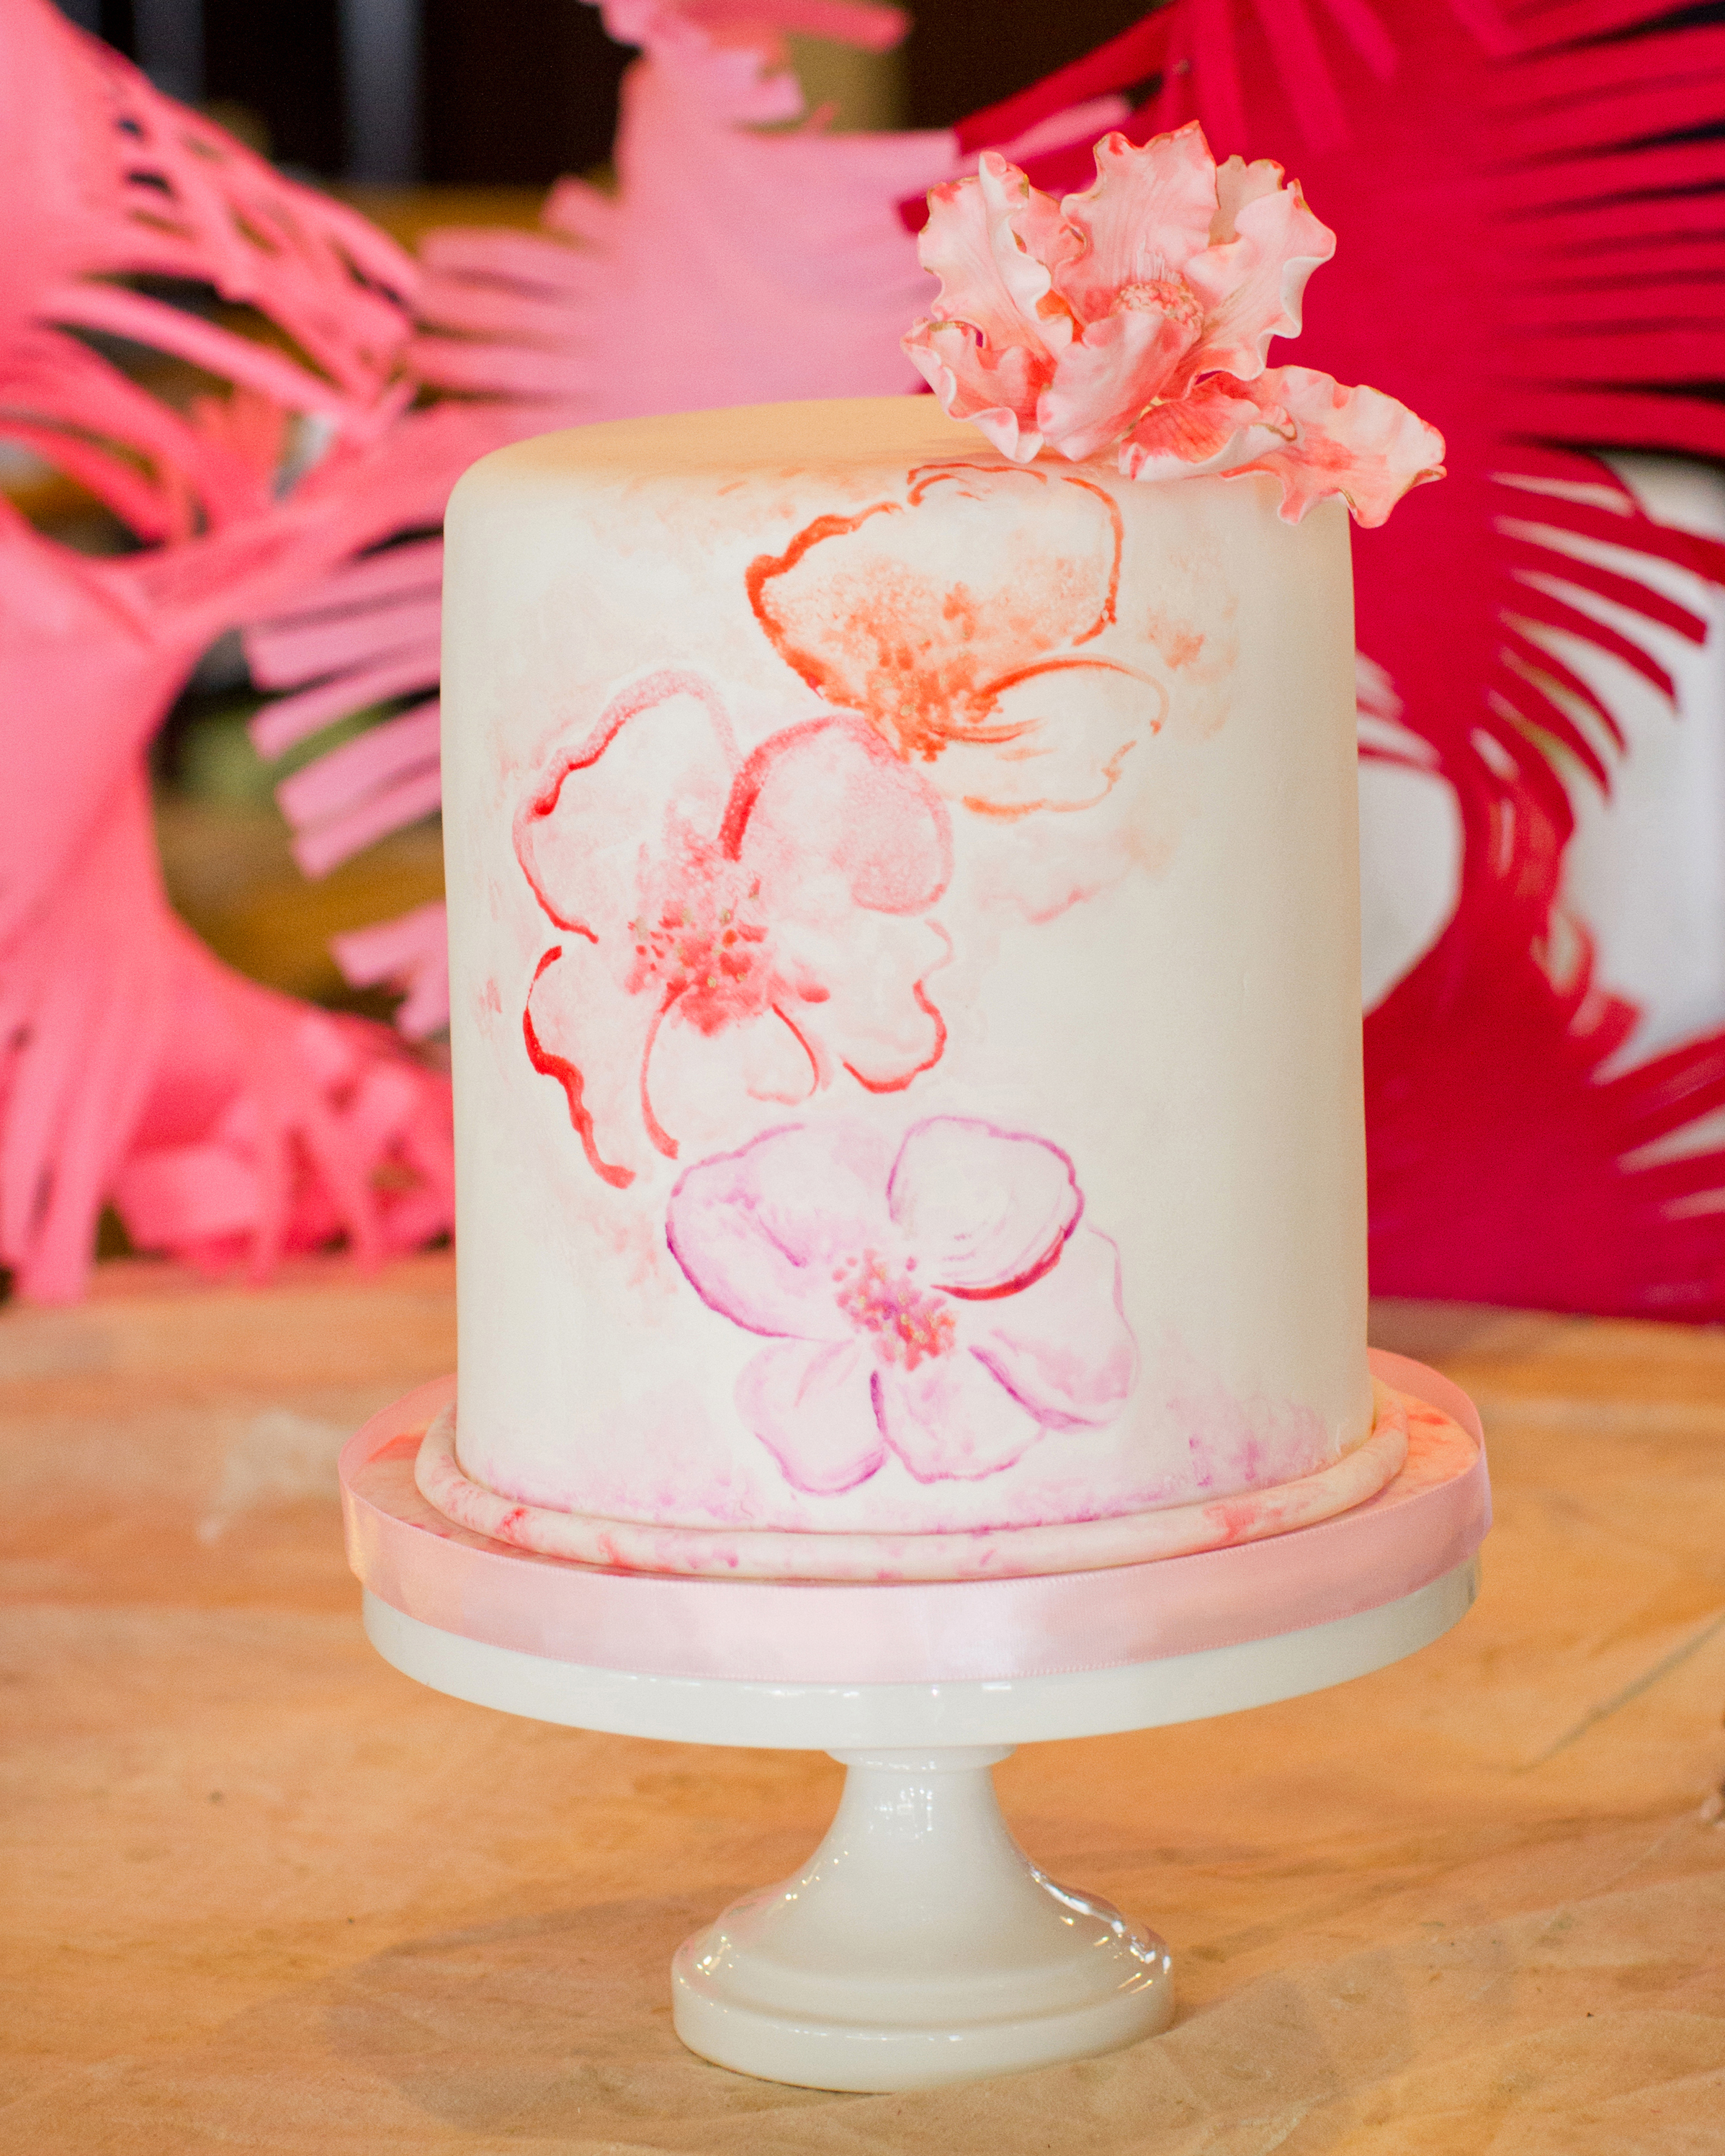 cake-pros-acakelife-0414.jpg